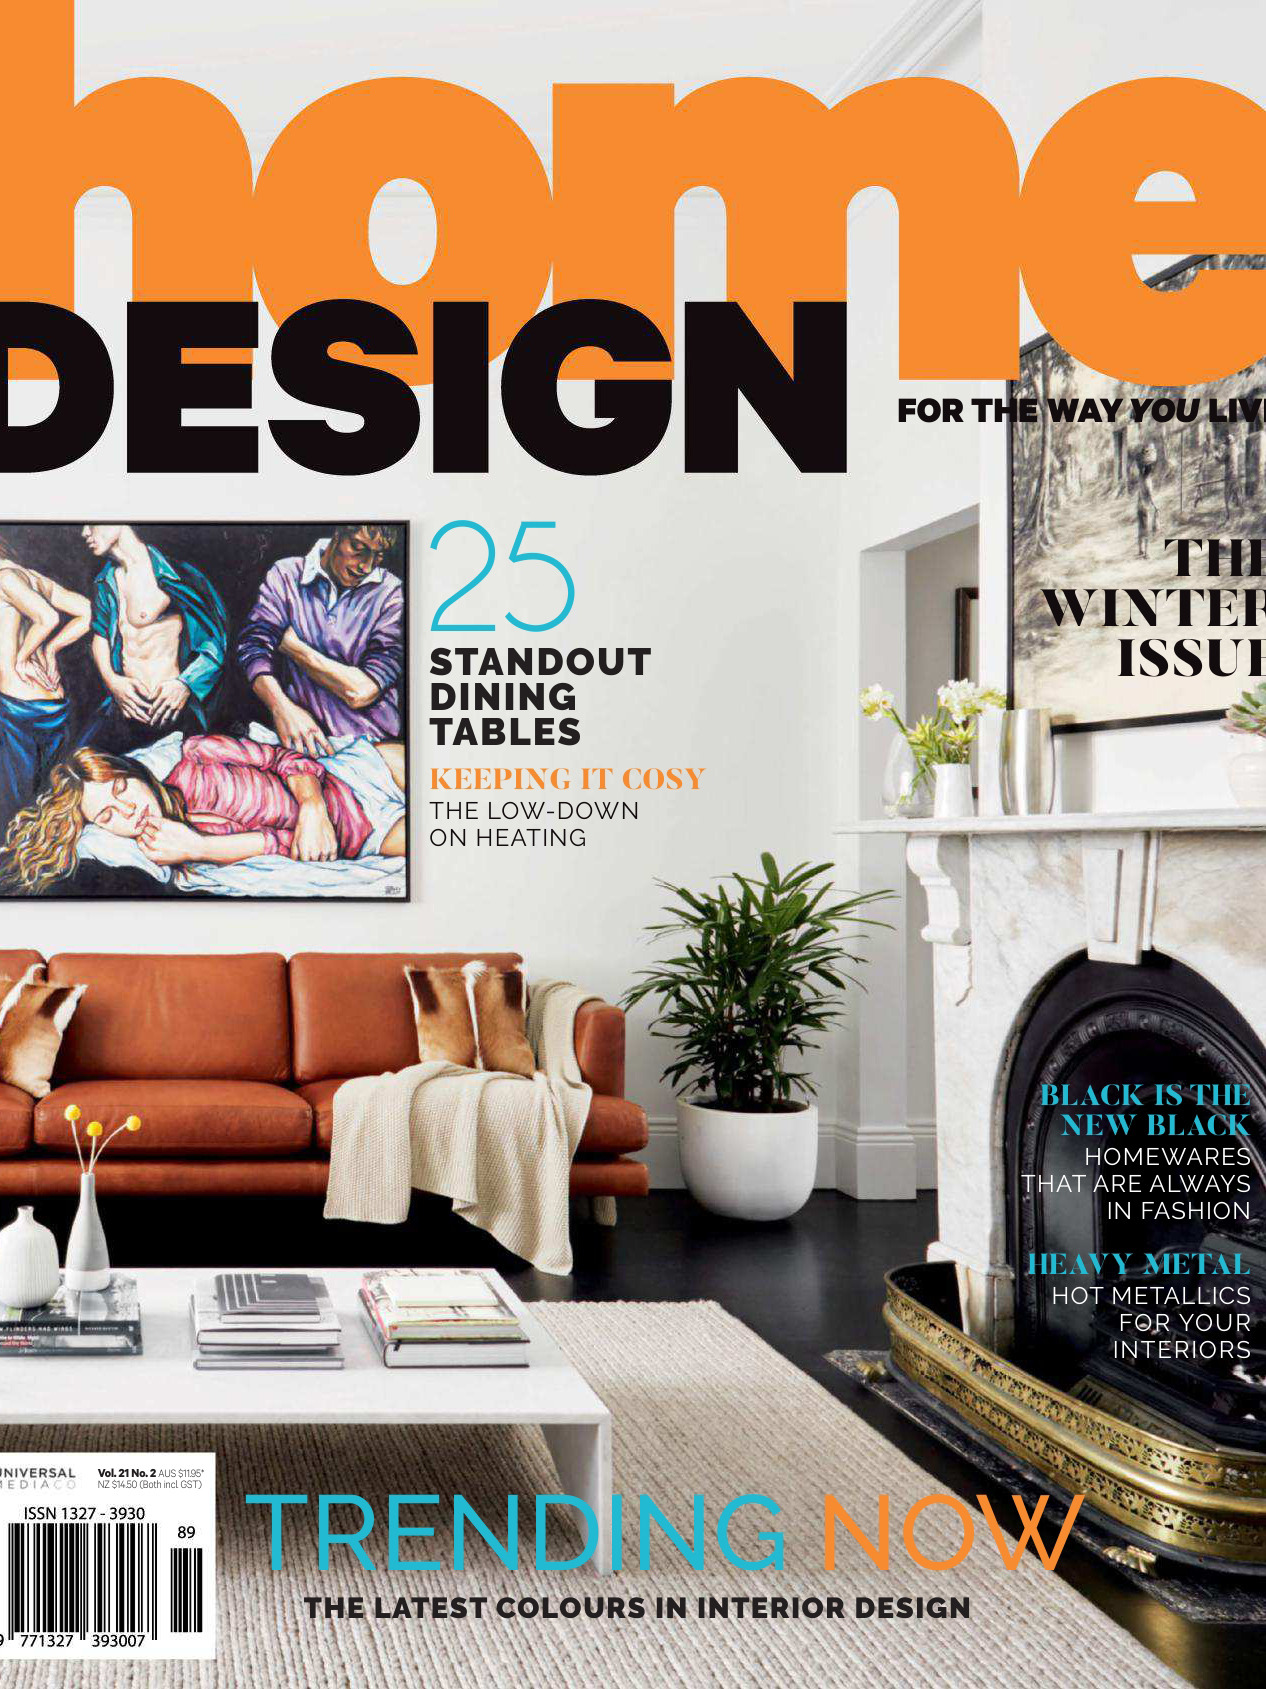 《Luxury Home Design》澳大利亚版时尚家纺杂志2018年04月号(Vol-21.No.2)